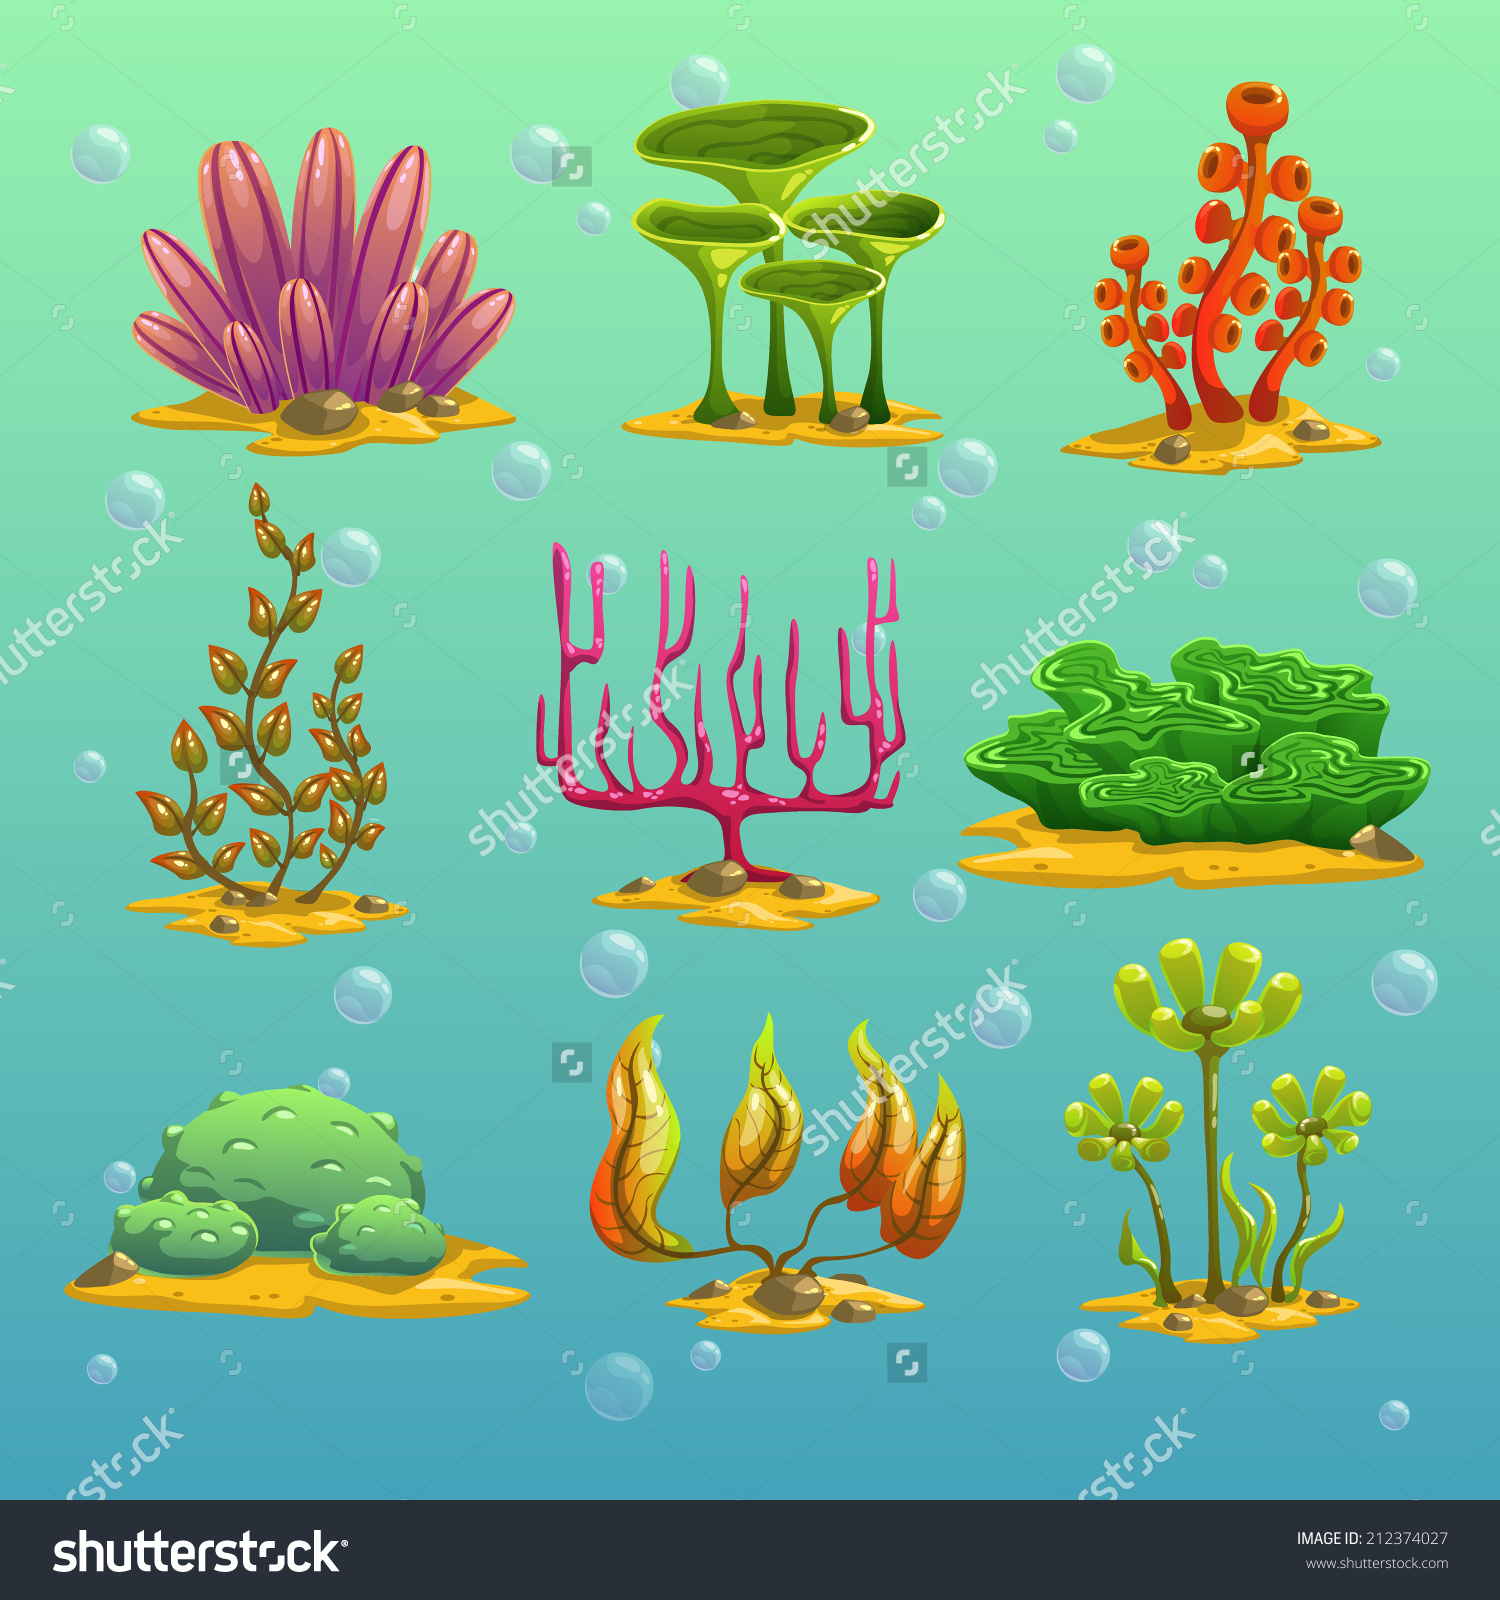 Algae clipart cute Set 2 Cartoon Shutterstock 2